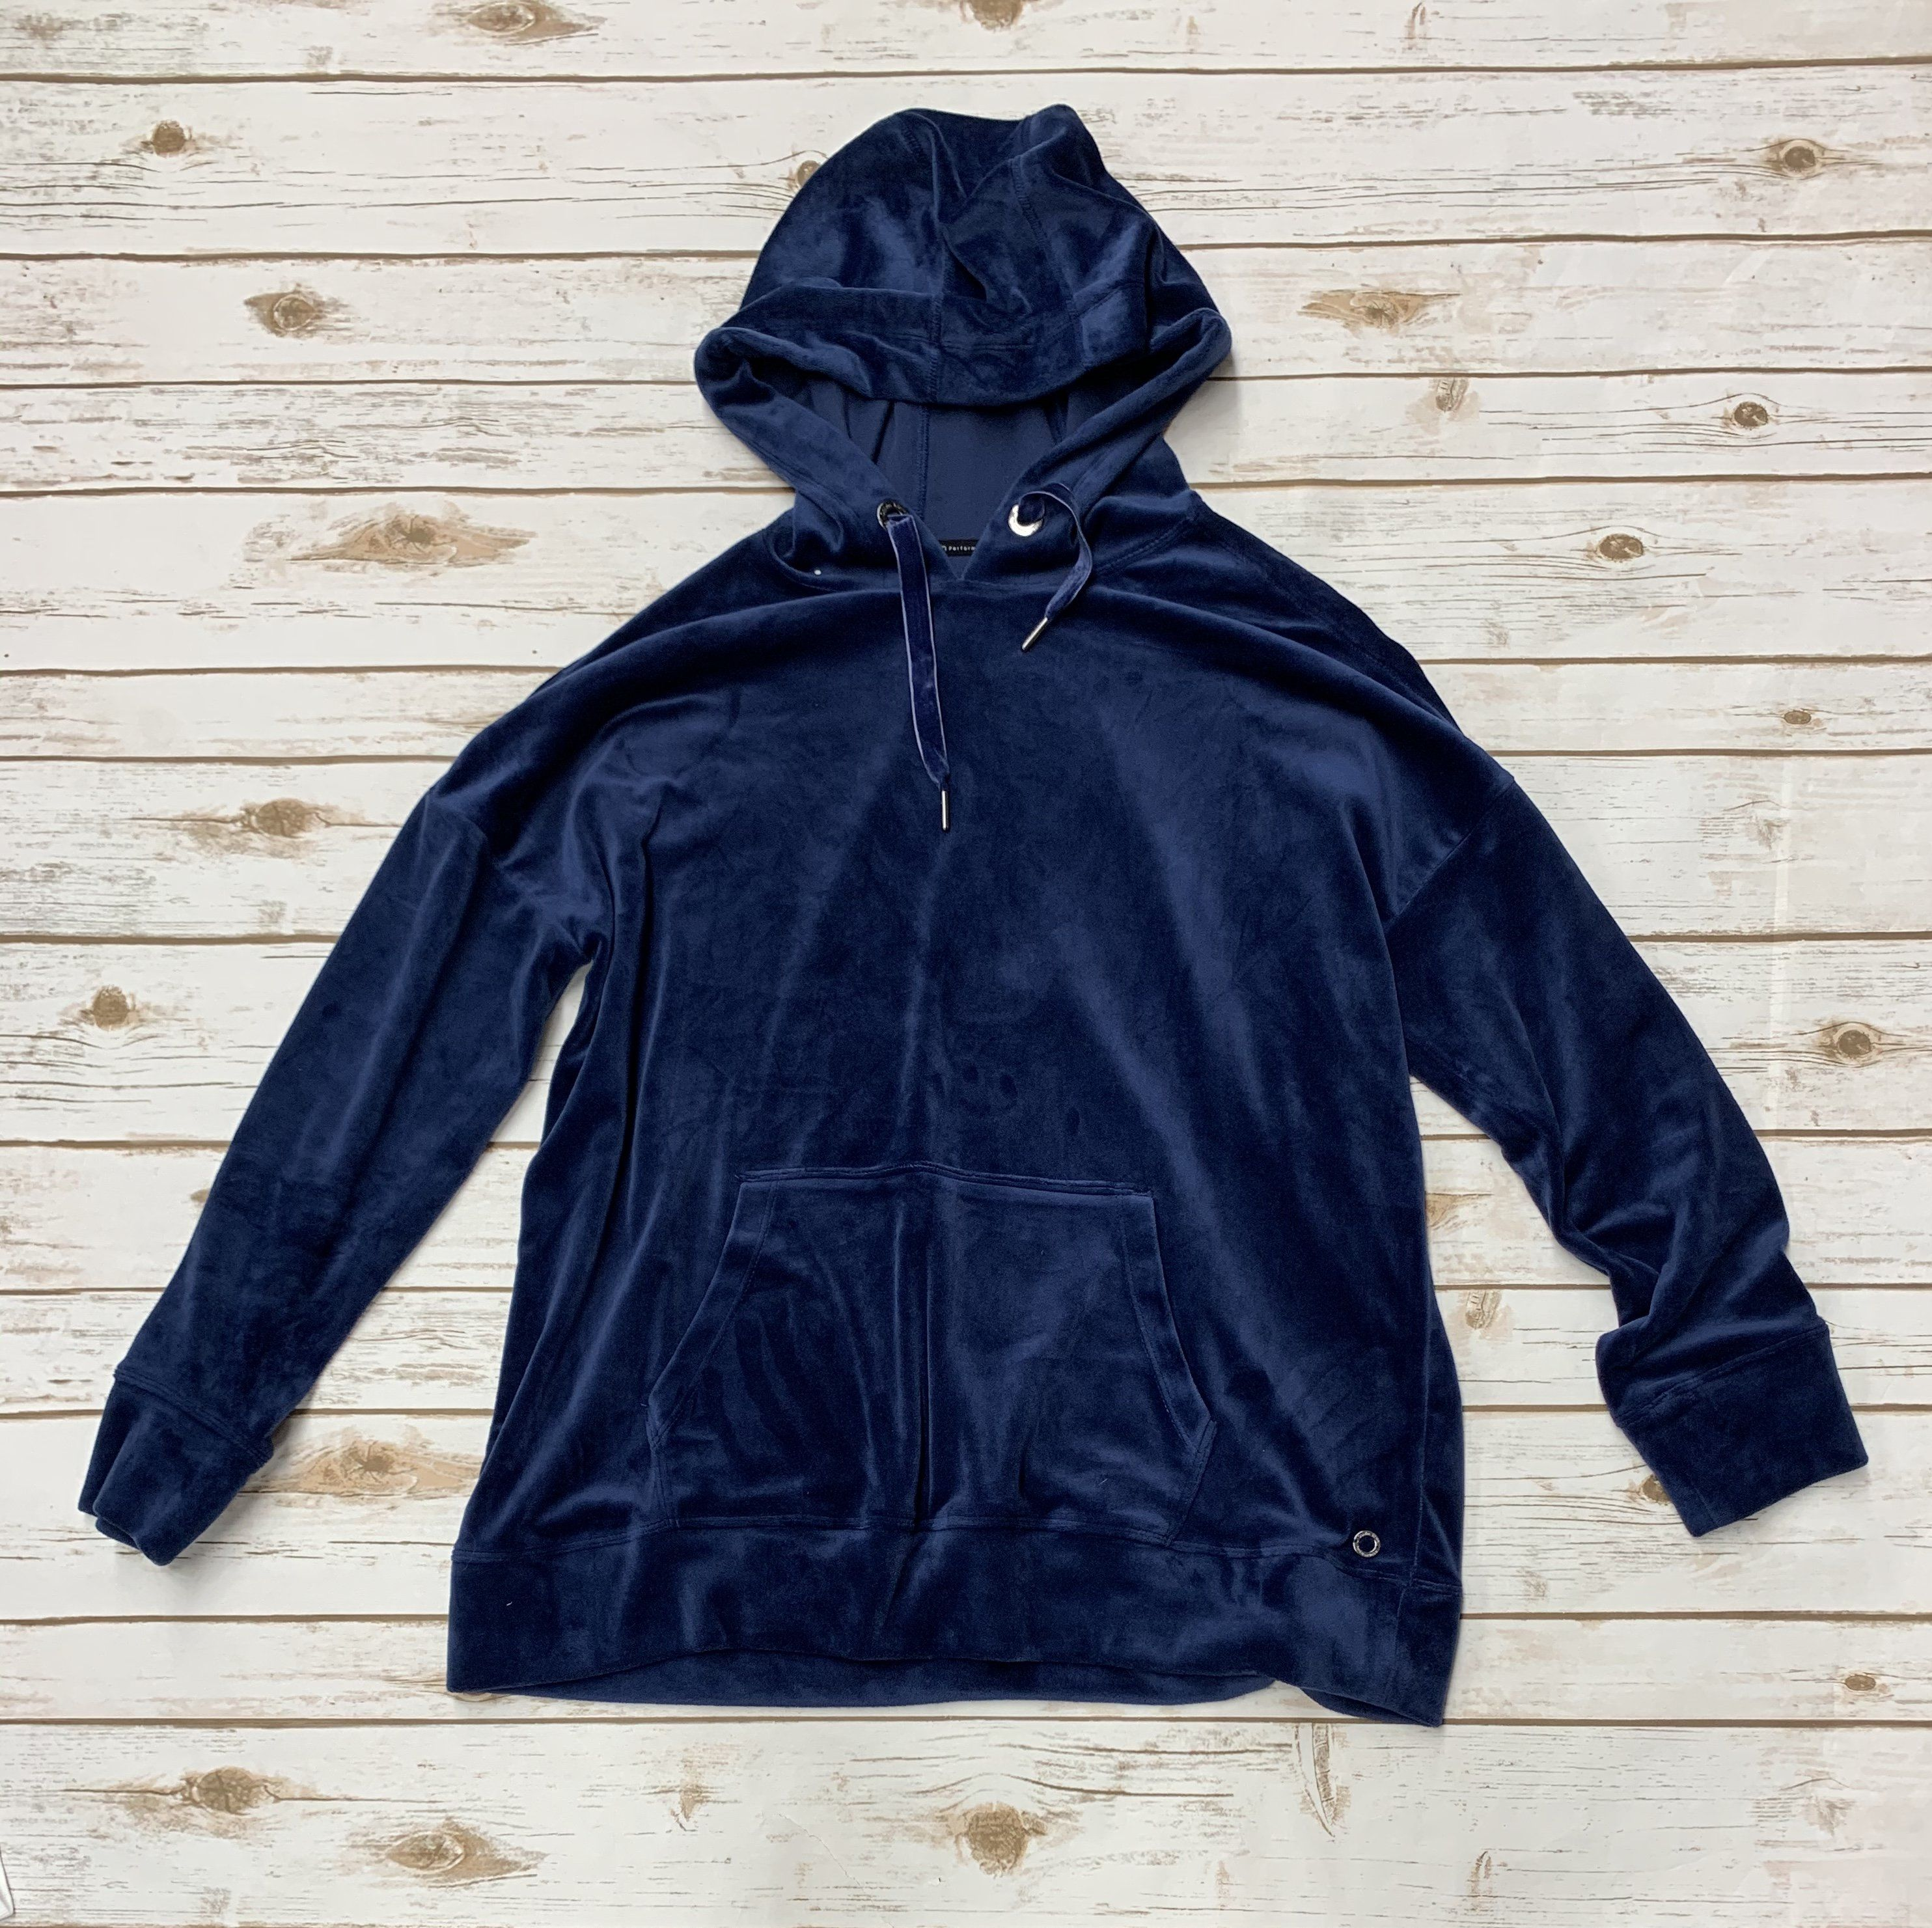 Sweatshirt Hoodie By Calvin Klein Performance  Size: M